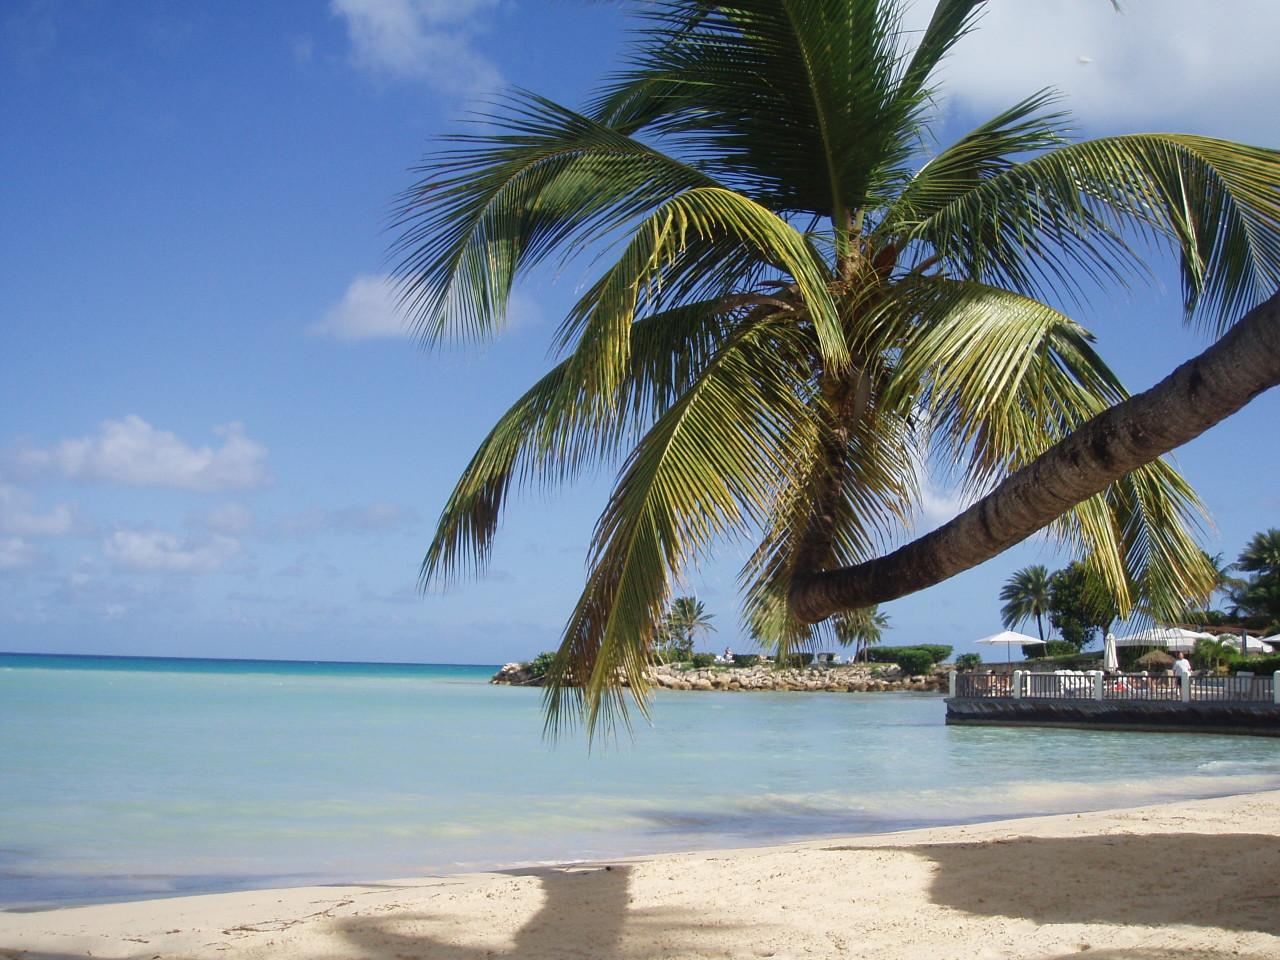 Beach Palm Trees Wallpapers - WallpaperSafari